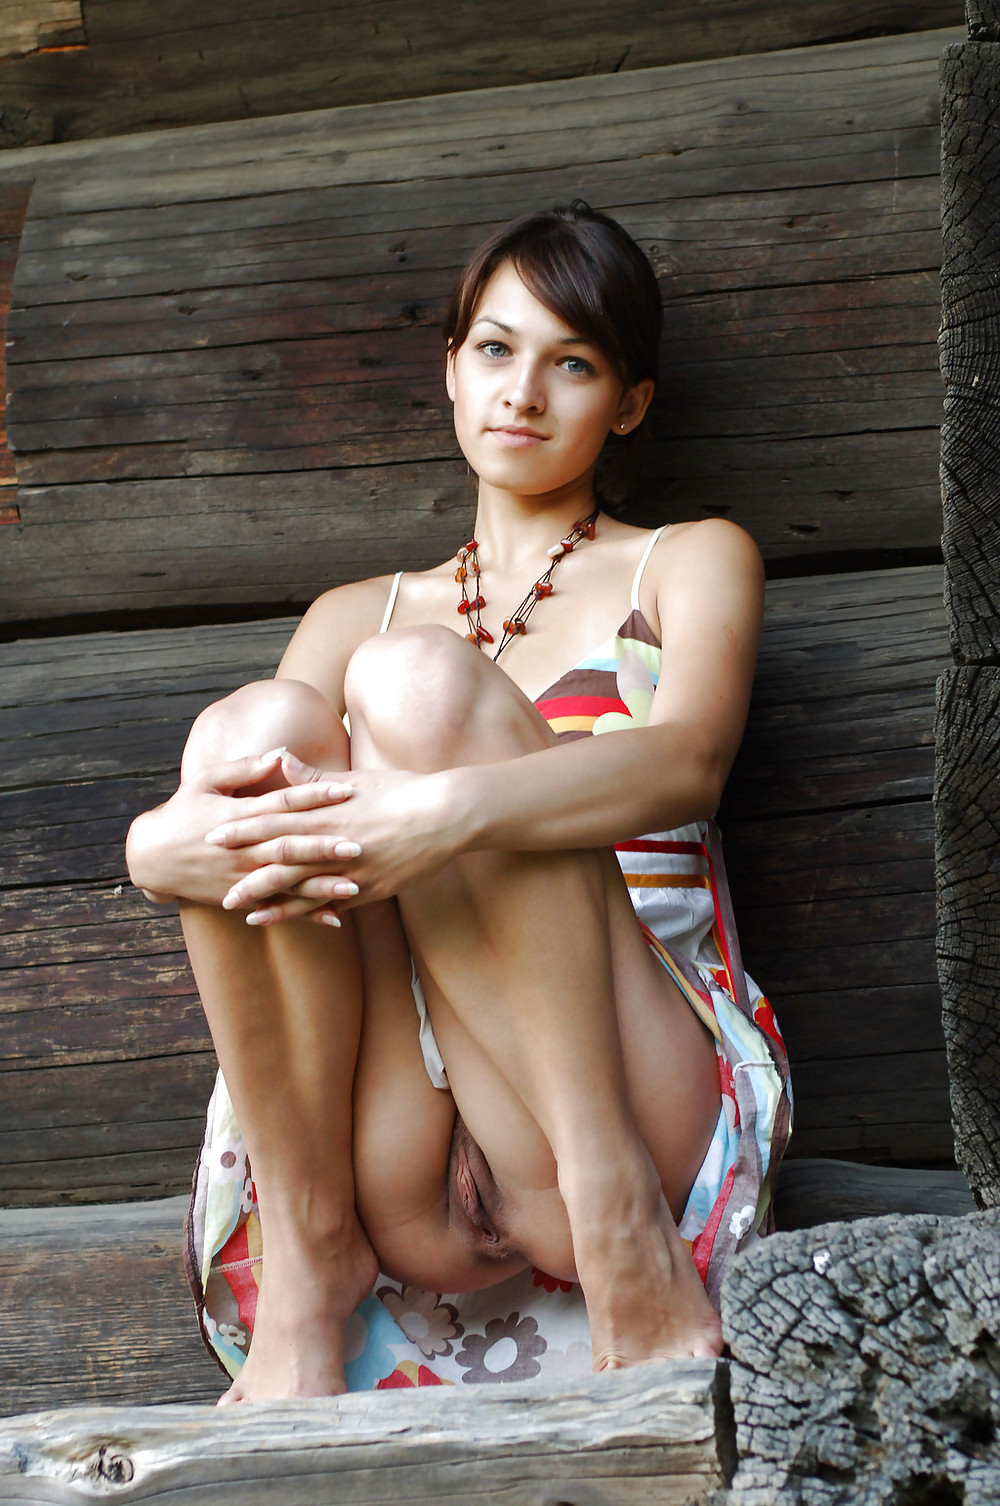 pussy Upskirt showing